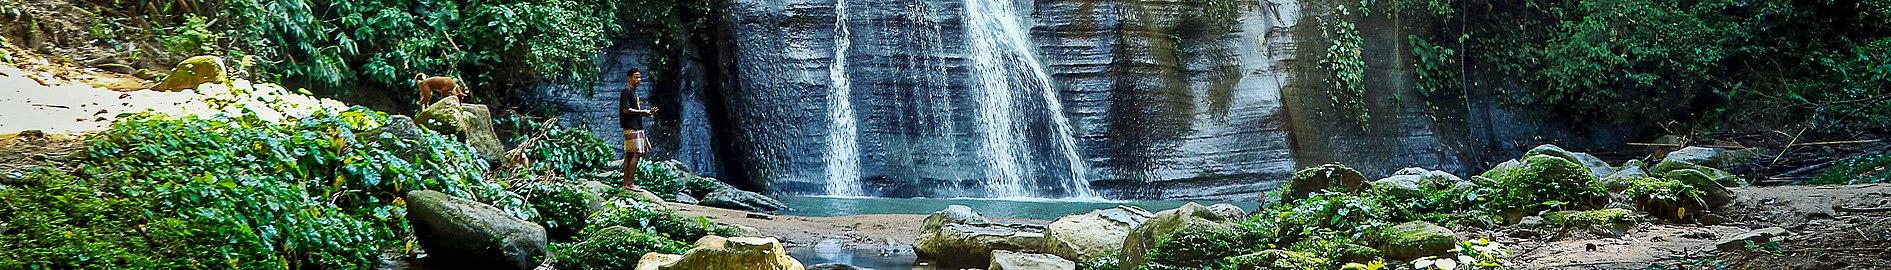 HamHam falls sylhet (cropped).jpg